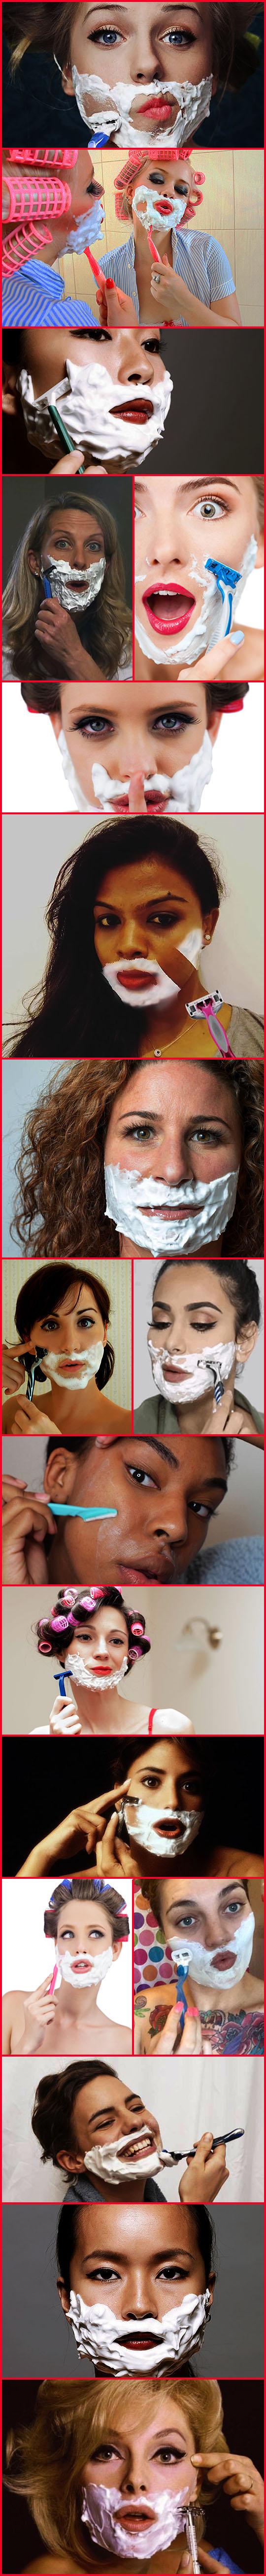 15. shaving_7-11-19.jpg